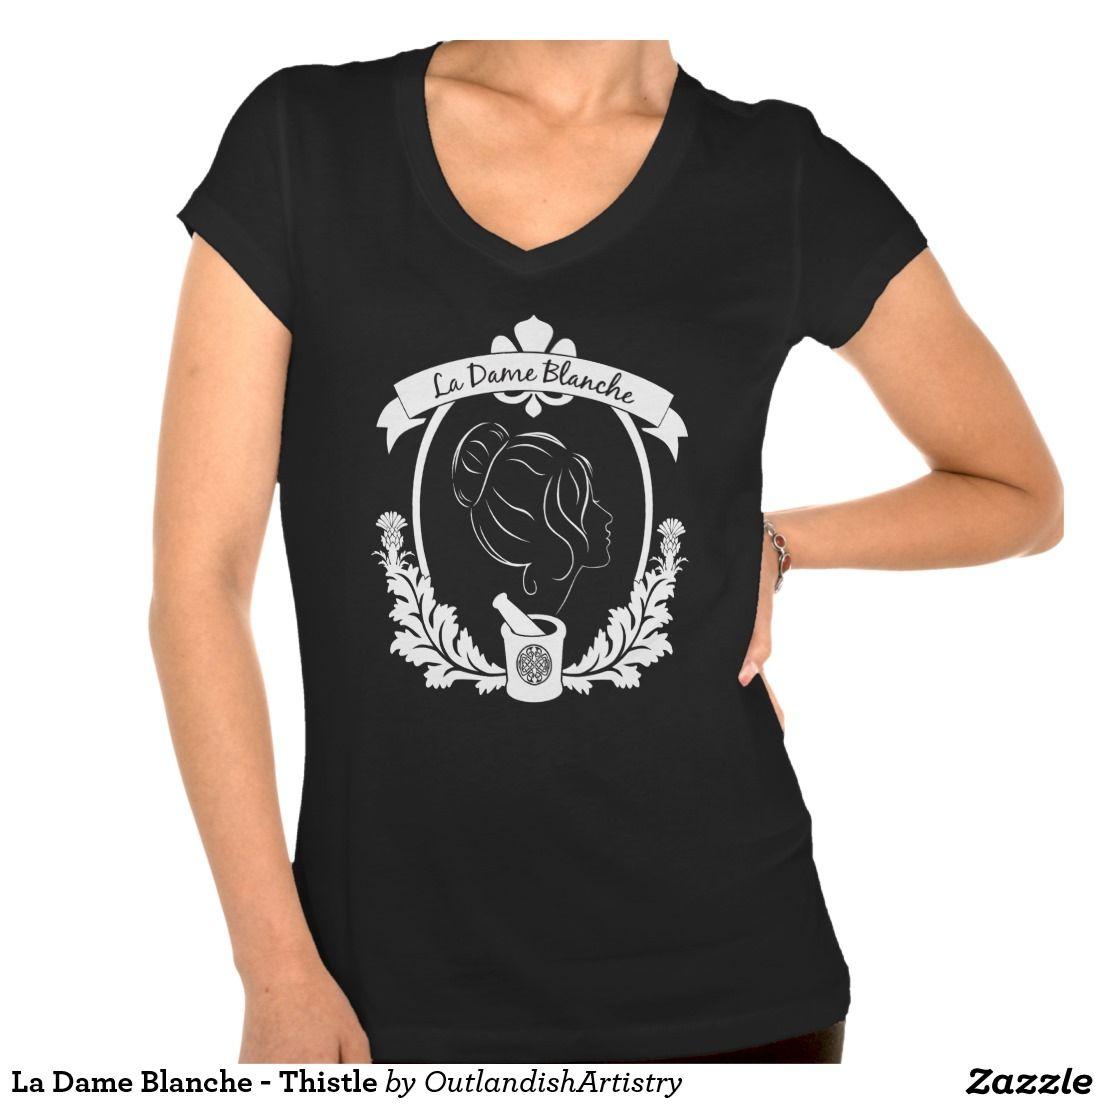 La Dame Blanche - Thistle T-shirt 2xl